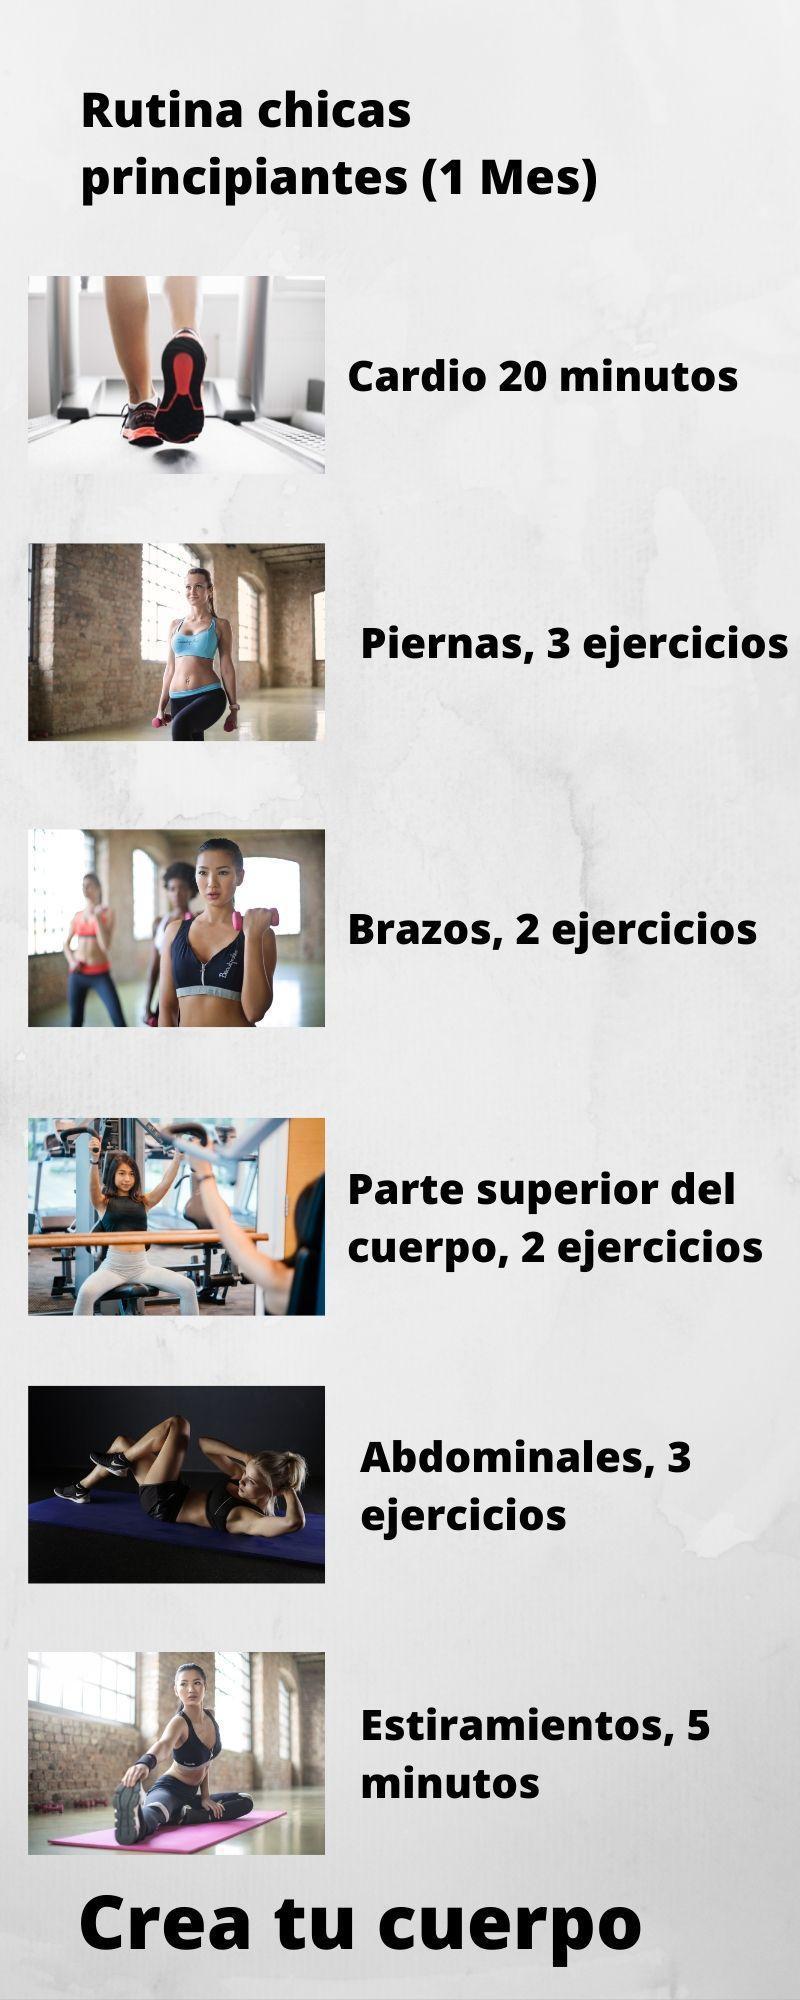 Infografia rutina chicas principiantes en el gimnasio